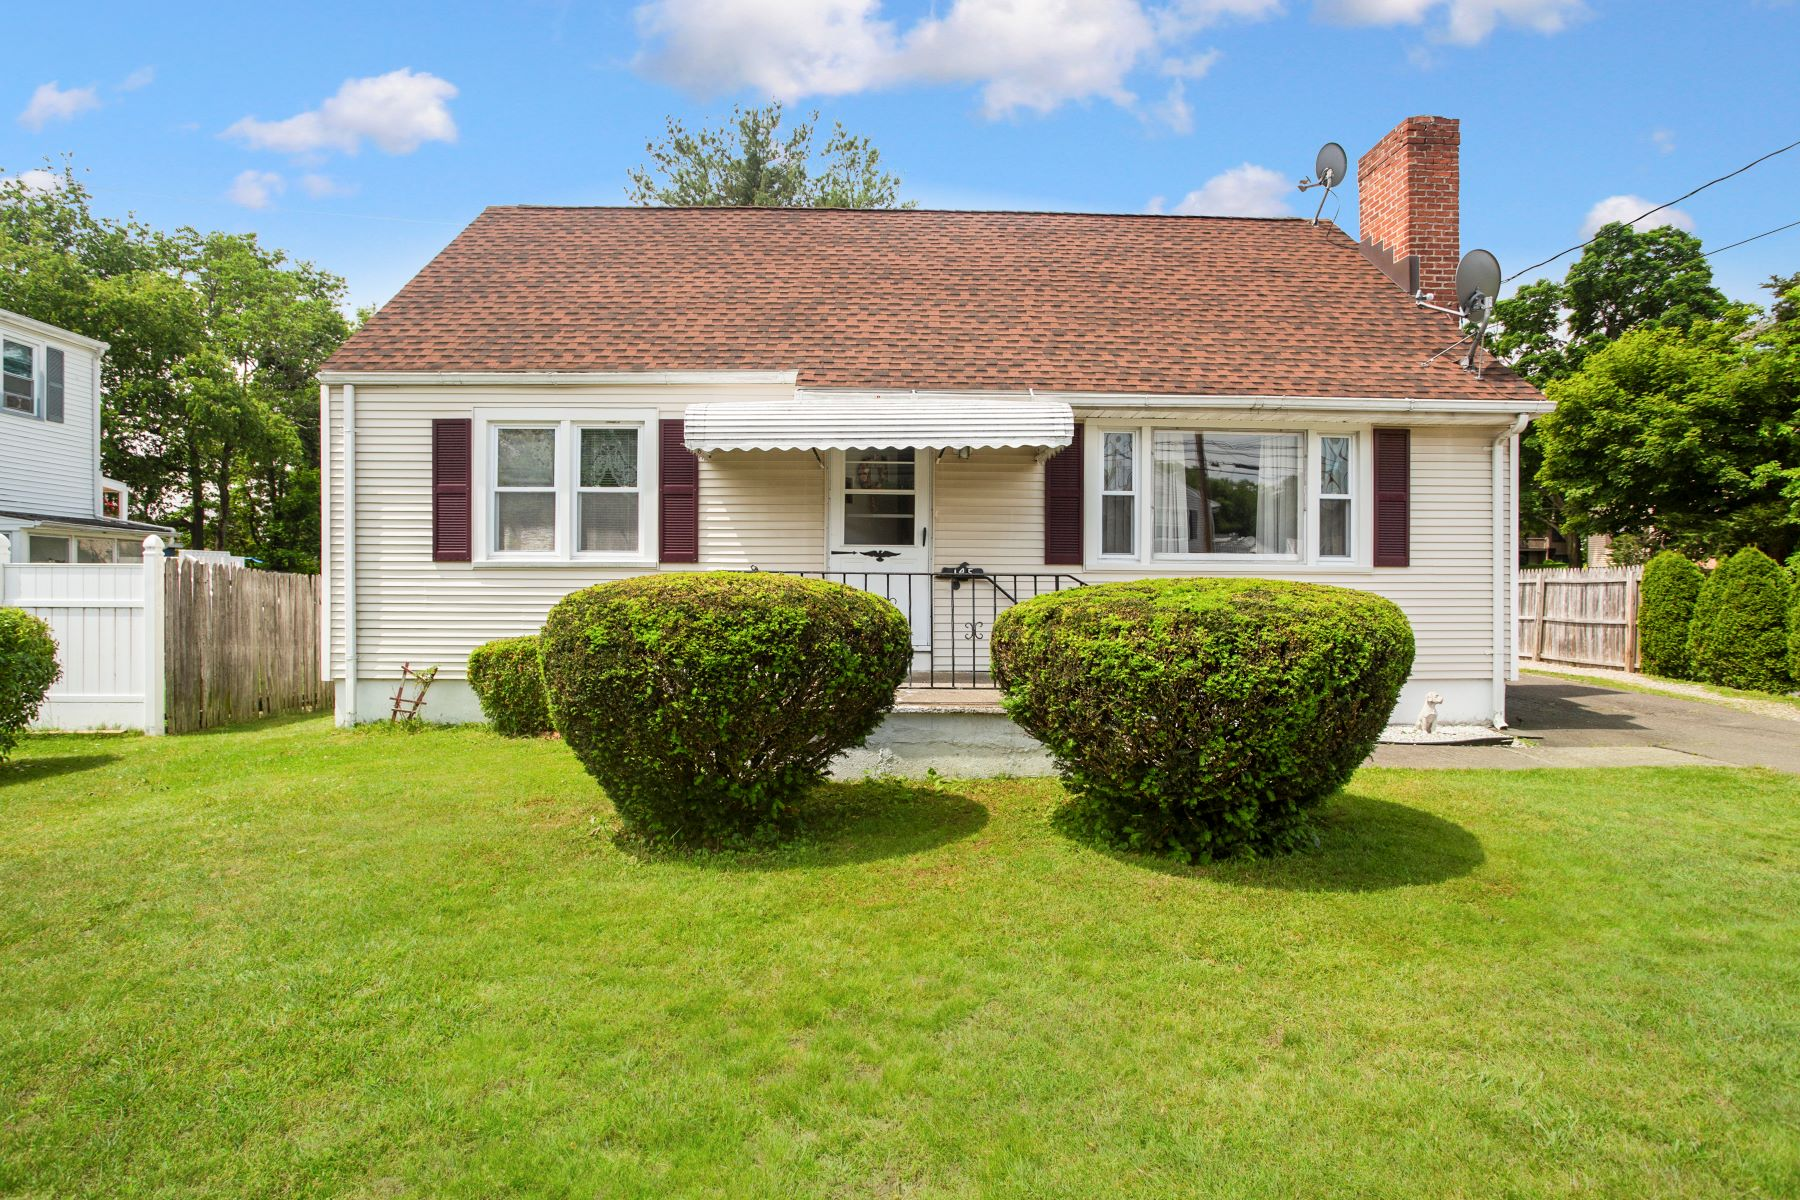 Single Family Homes для того Продажа на Well Built Cape Cod Home 145 Primrose Avenue, Bridgeport, Коннектикут 06606 Соединенные Штаты